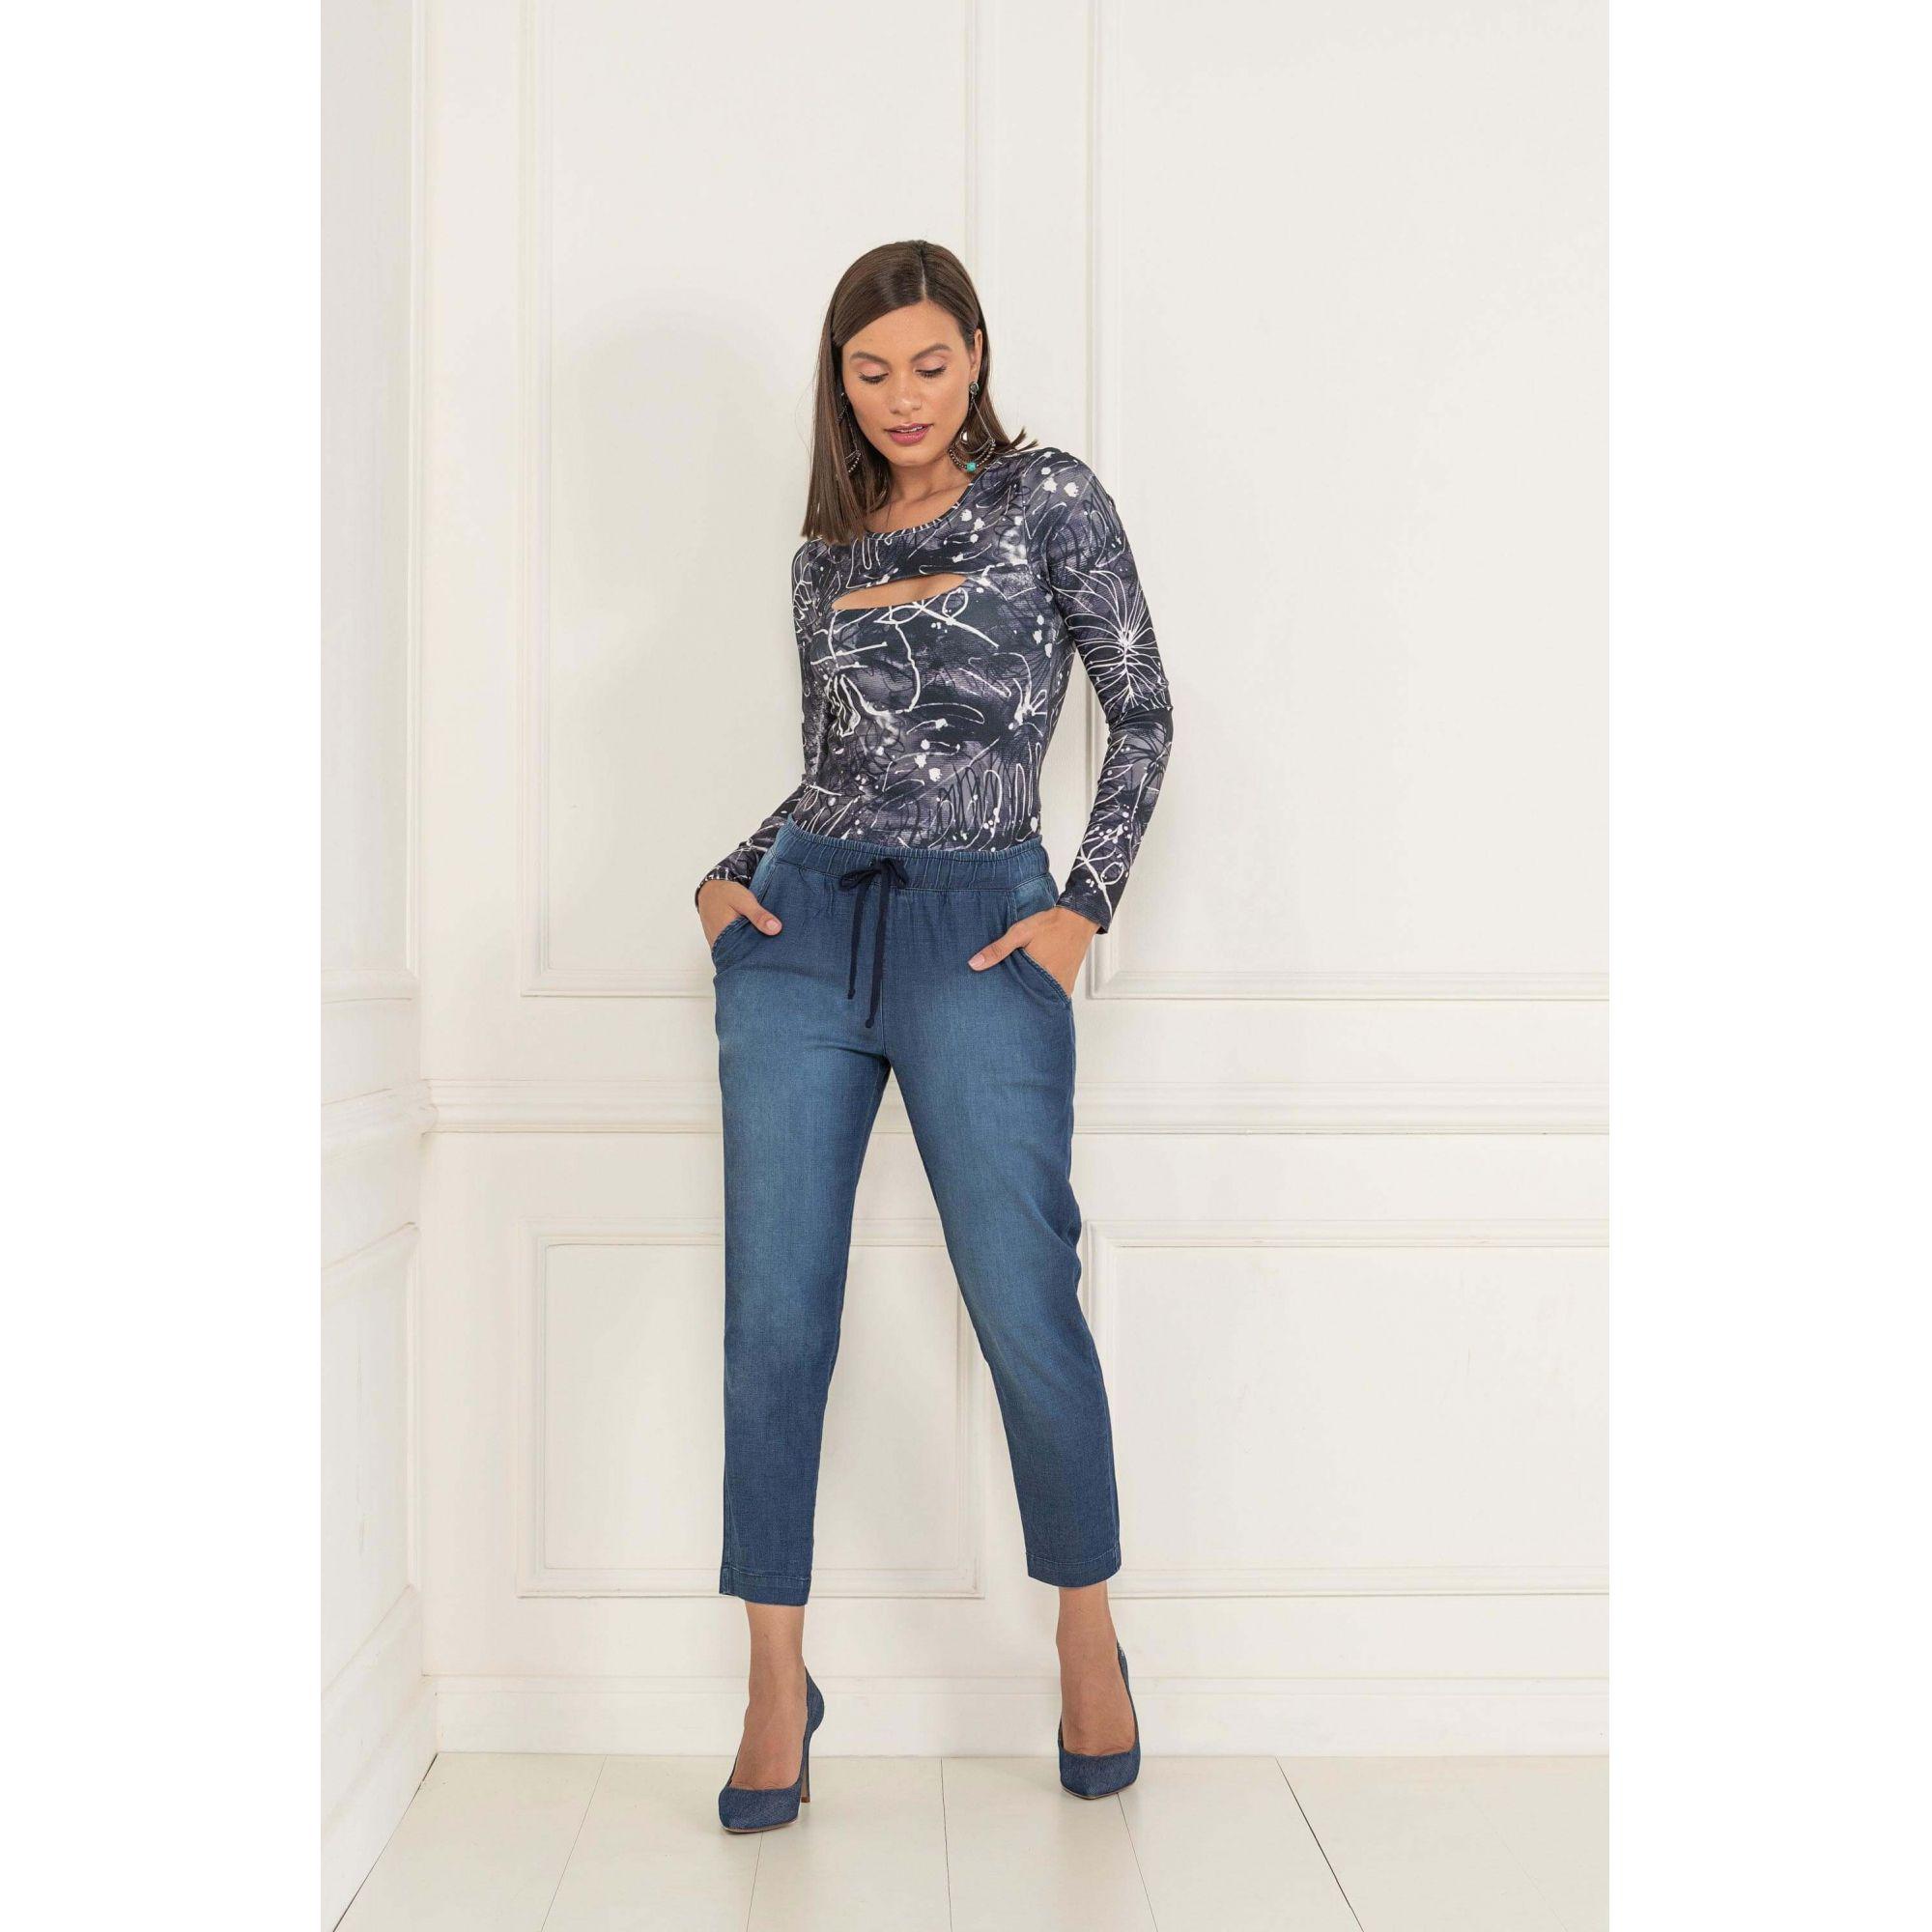 Calça Jogger Lycra Jeans - KACOLAKO